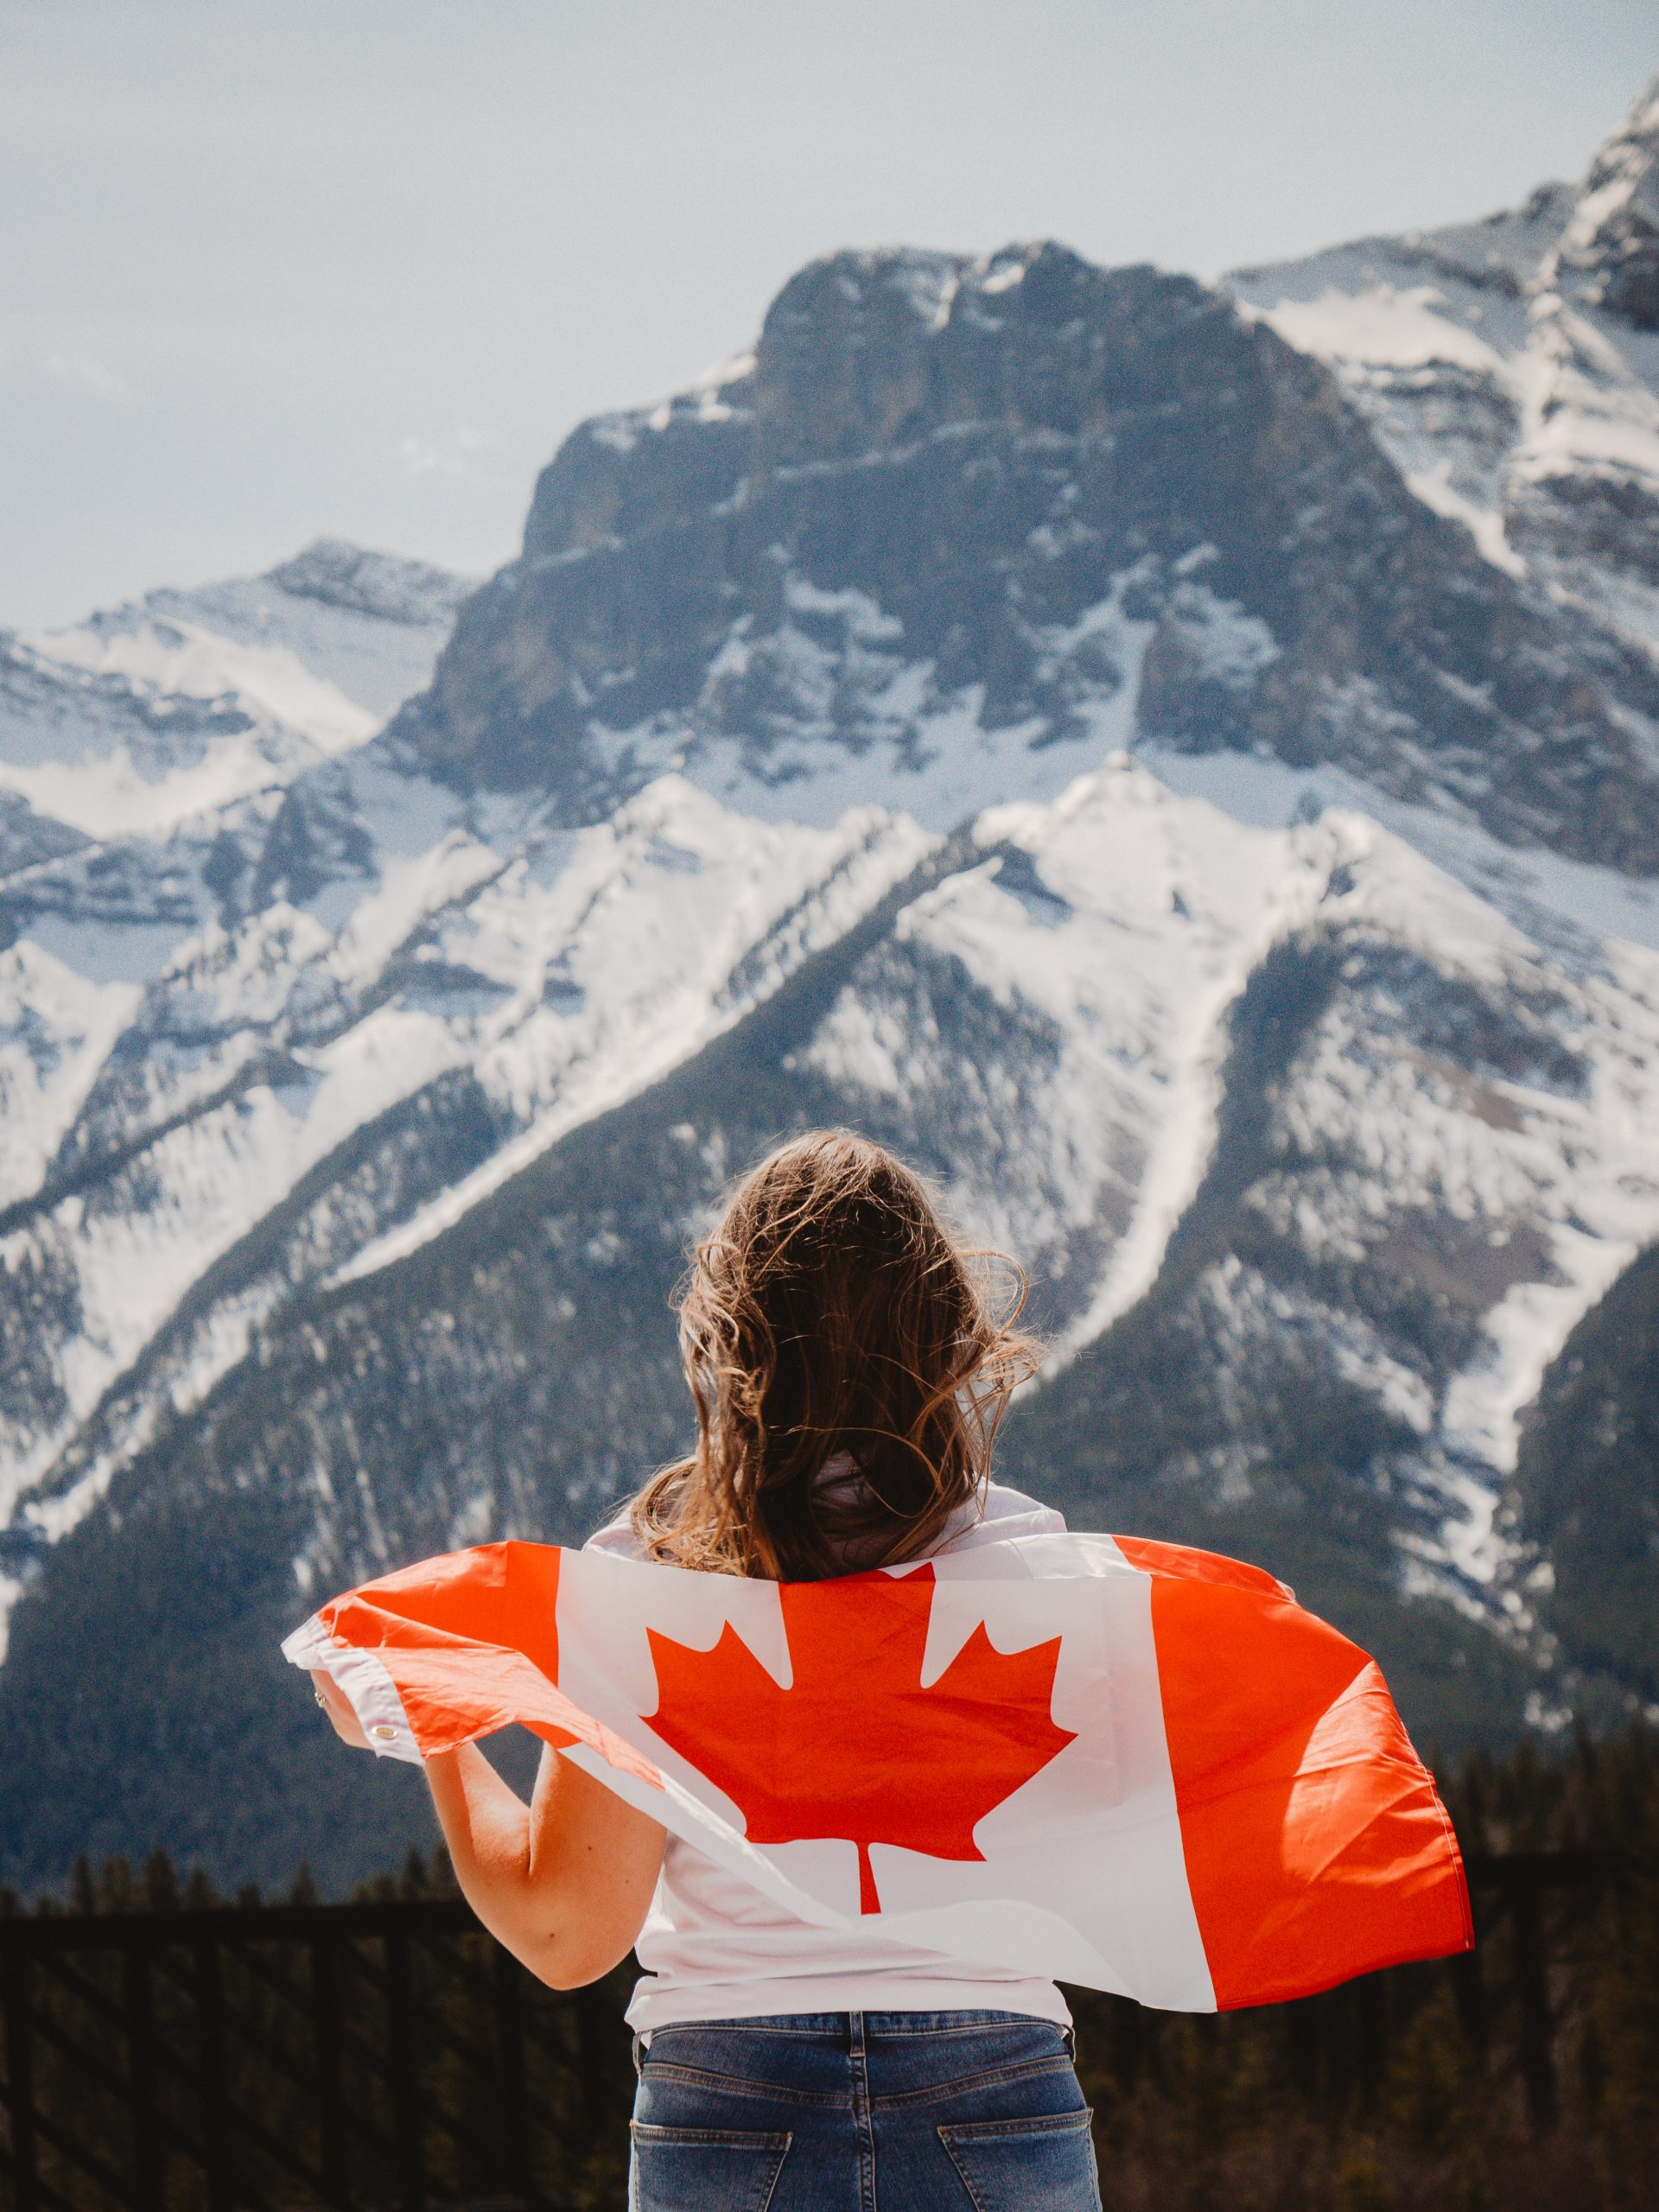 canada translation services, passport translation services immigration translation services,